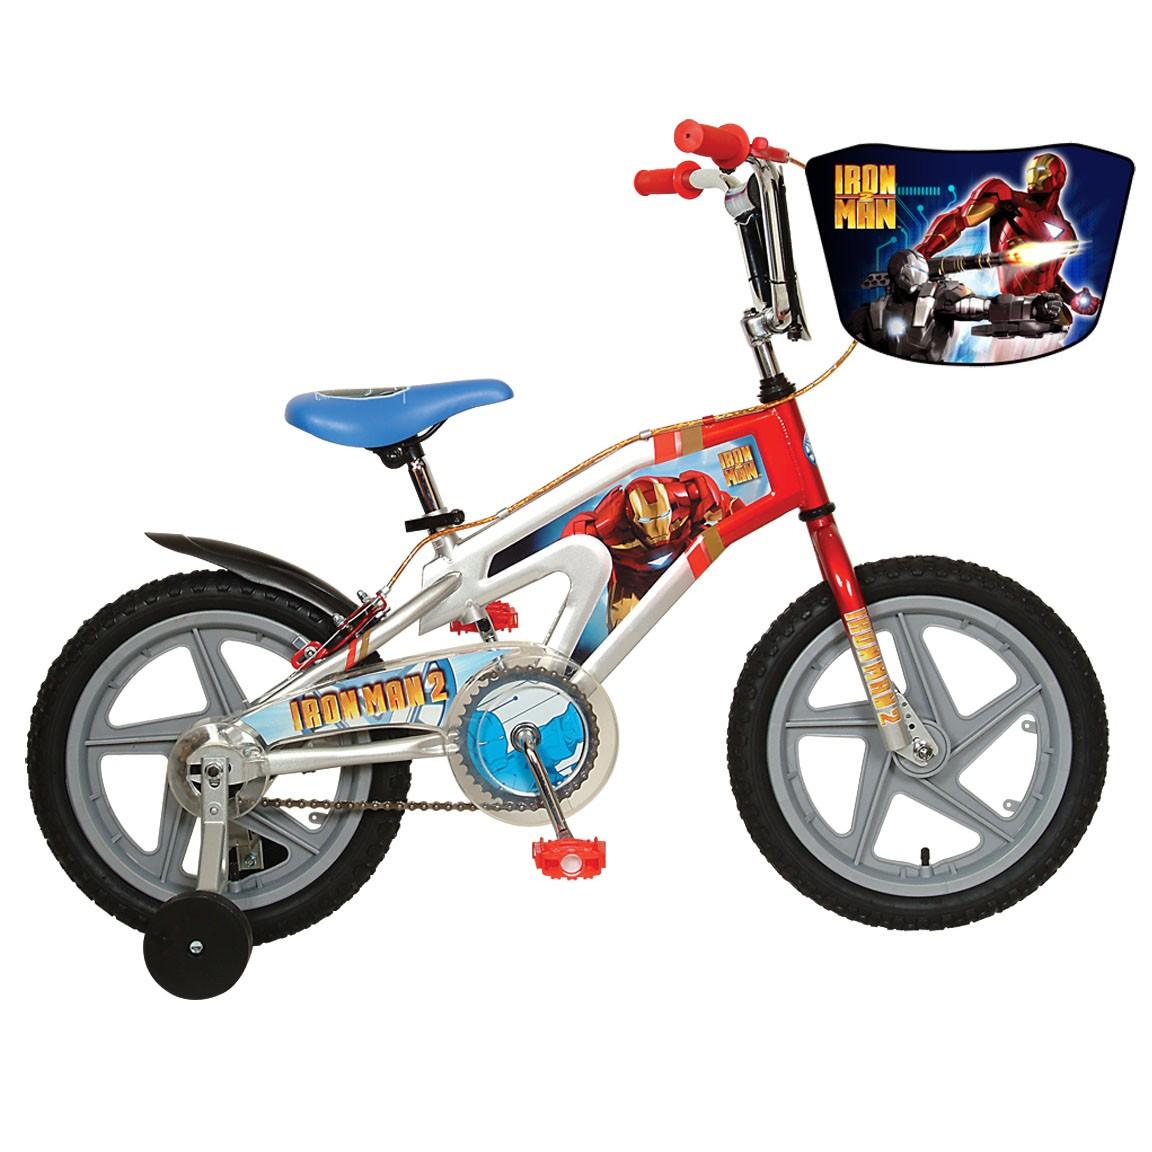 Ironman 16 inch Cycle Force Bike